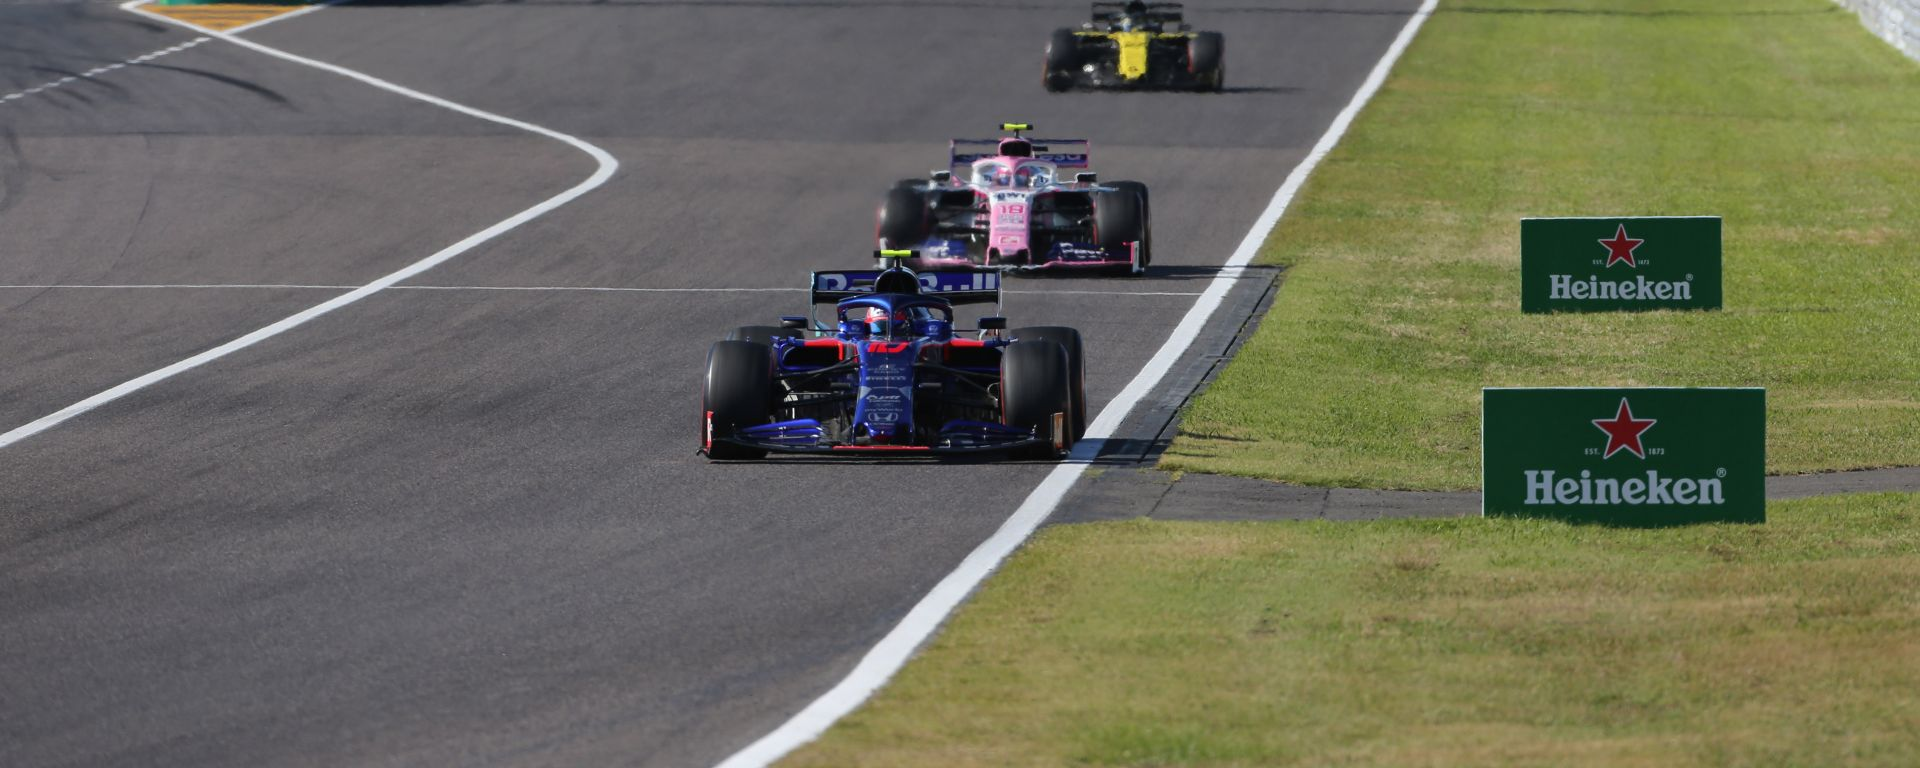 F1, GP Giappone 2019: Pierre Gasly (Toro Rosso) precedes Sergio Perez (Racing Point)